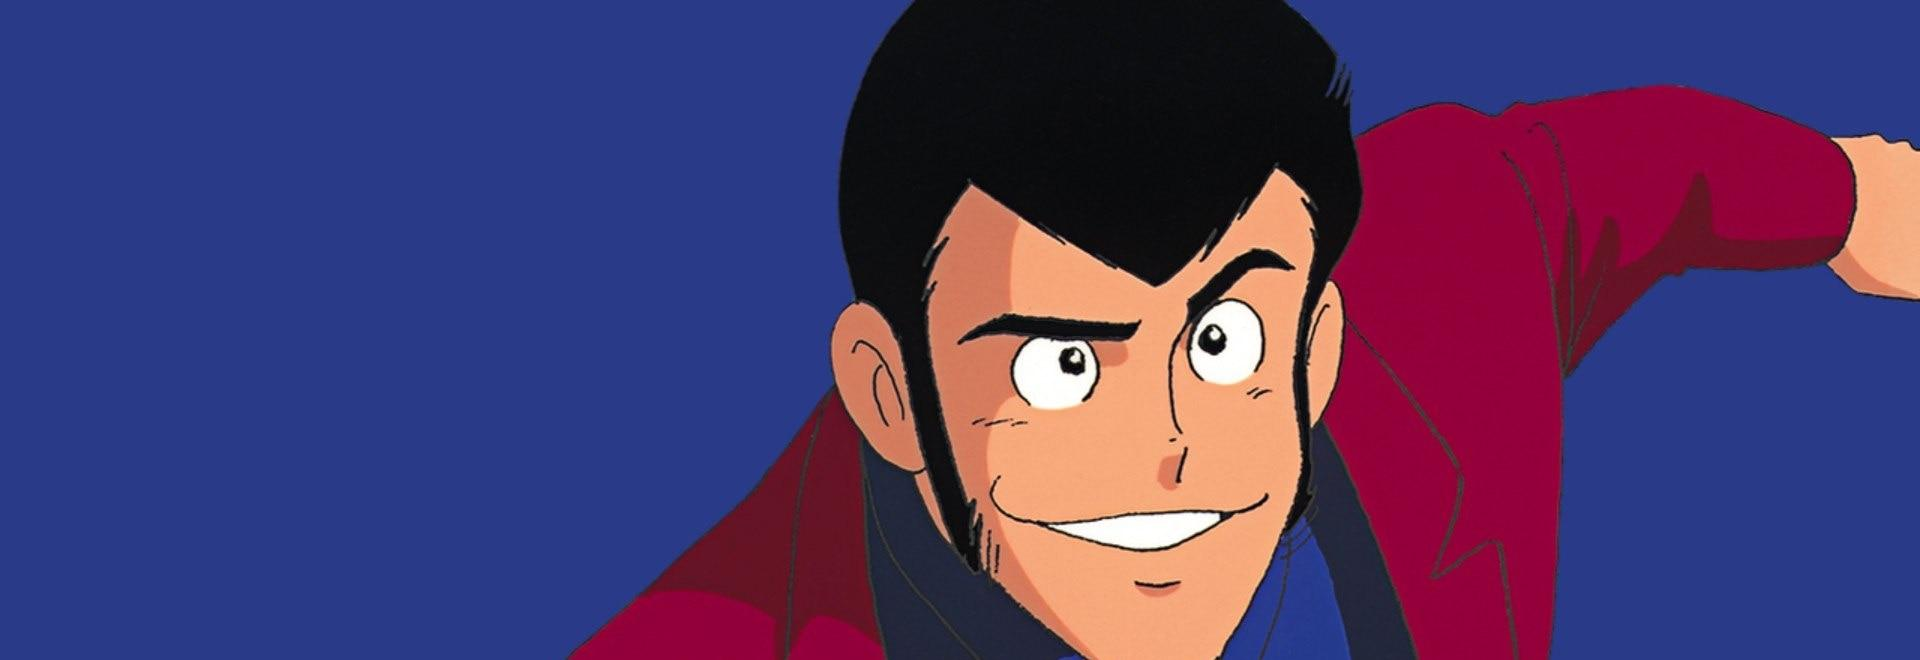 Lupin venduto all'asta